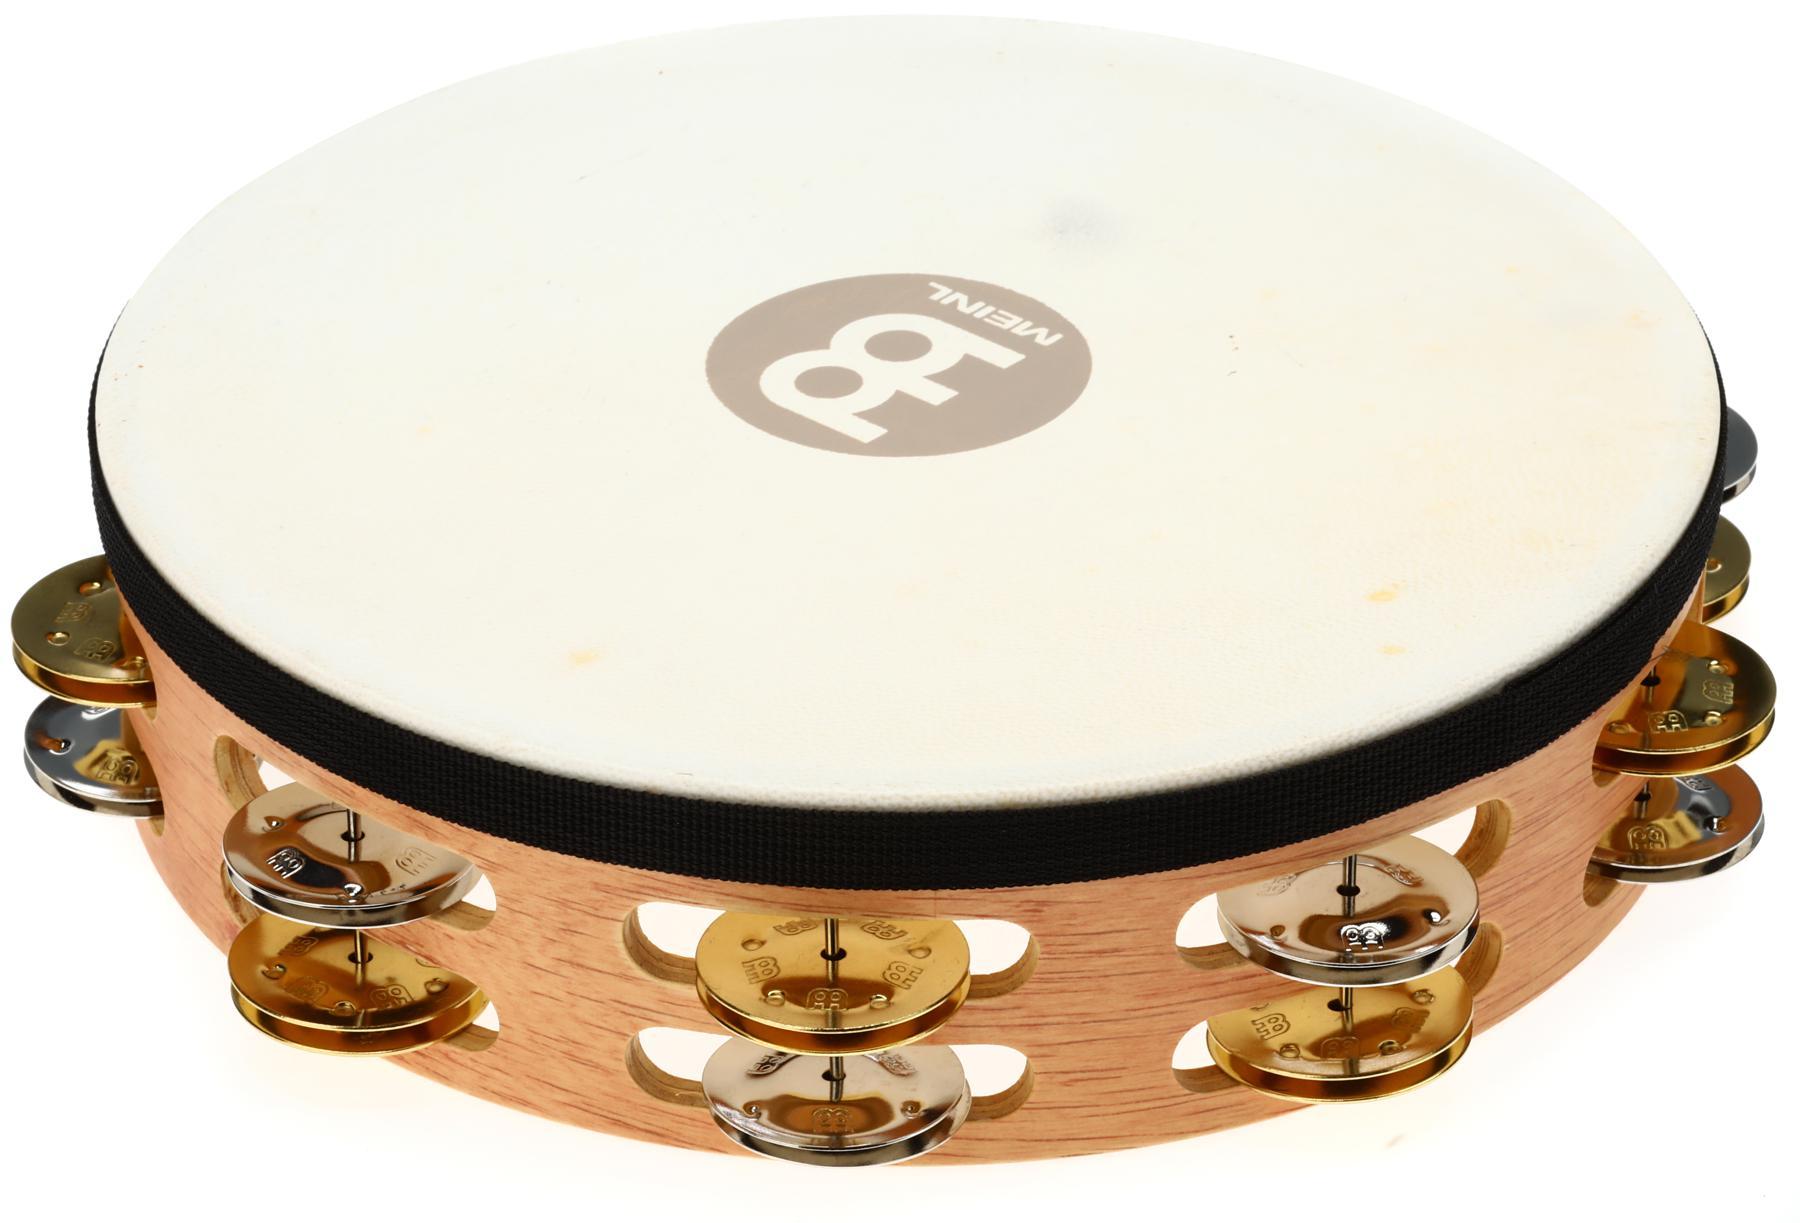 Meinl Percussion Recording-Combo Wood Tambourine